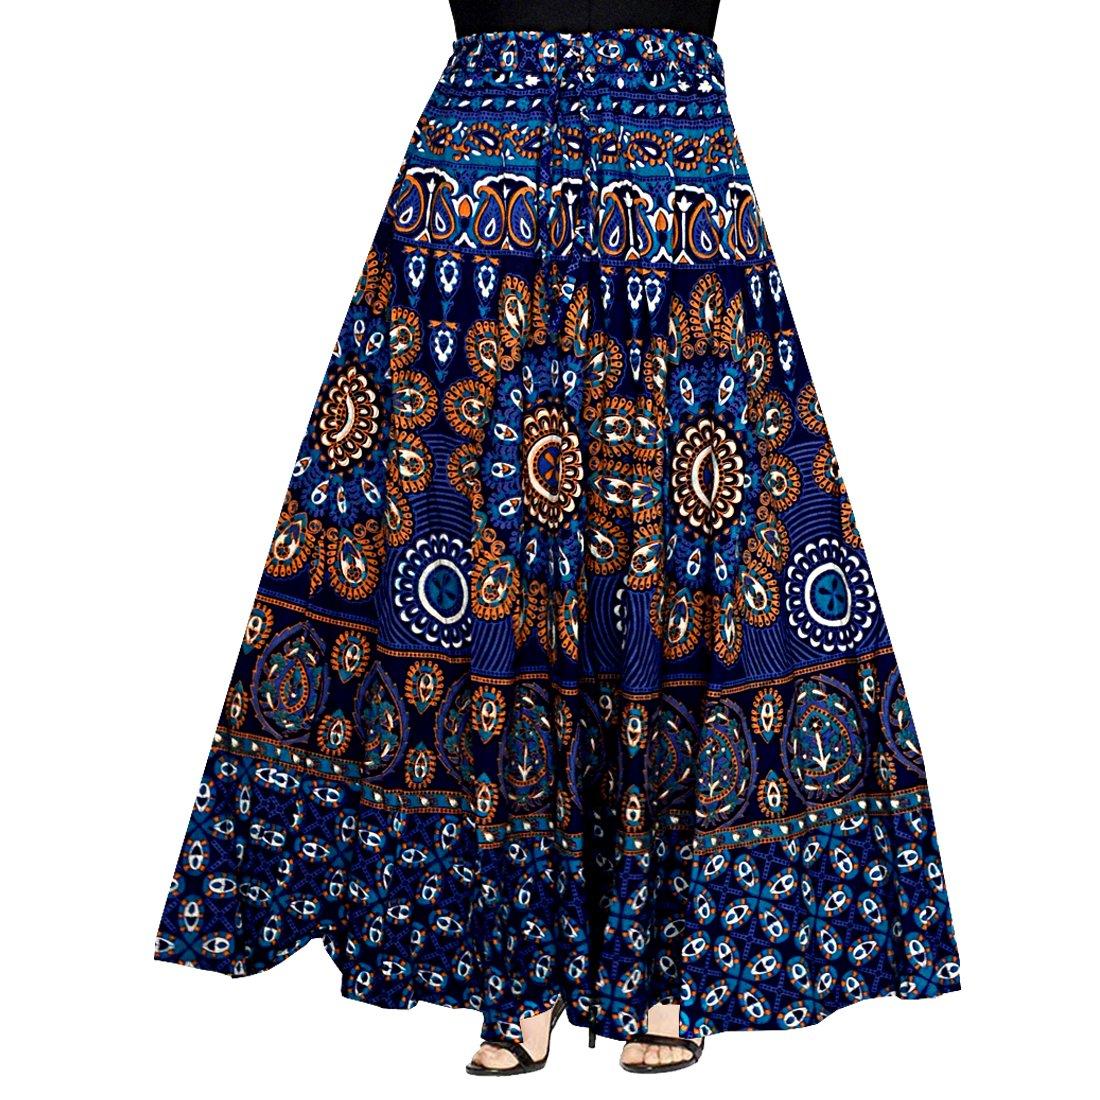 Mudrika Women's Cotton Skirt (Multicolor Free Size)